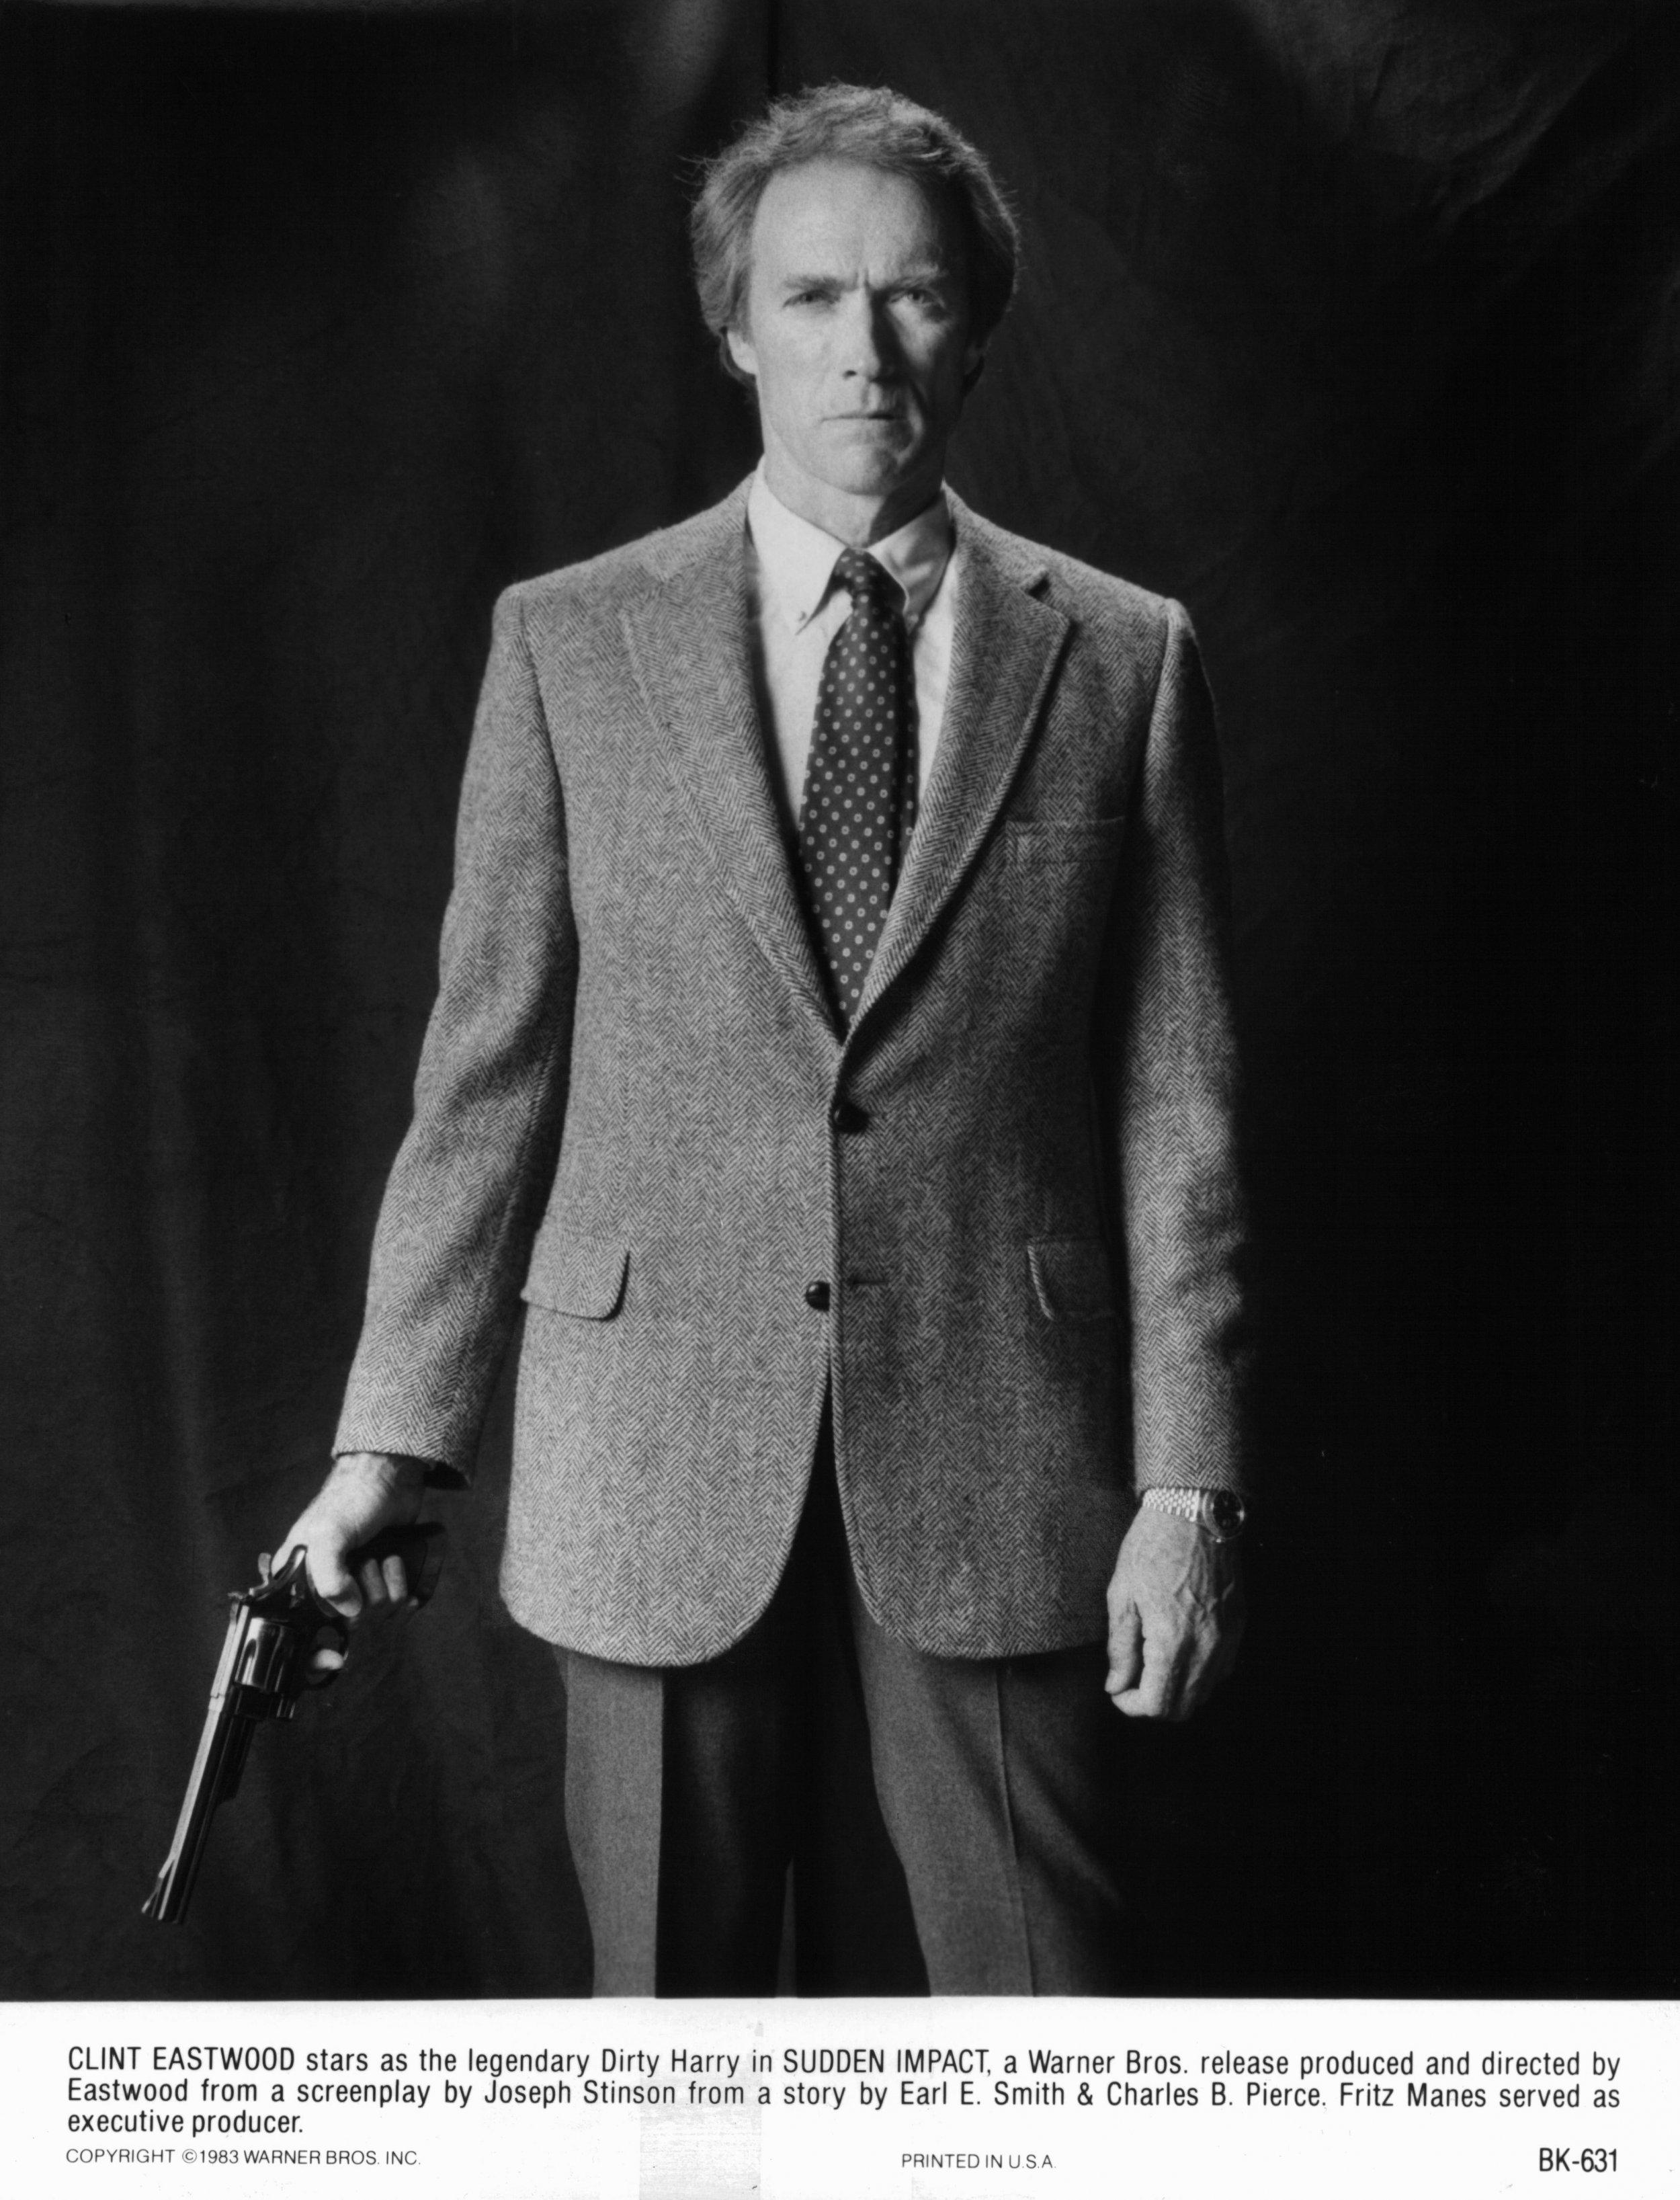 Clint Eastwood Sudden Impact